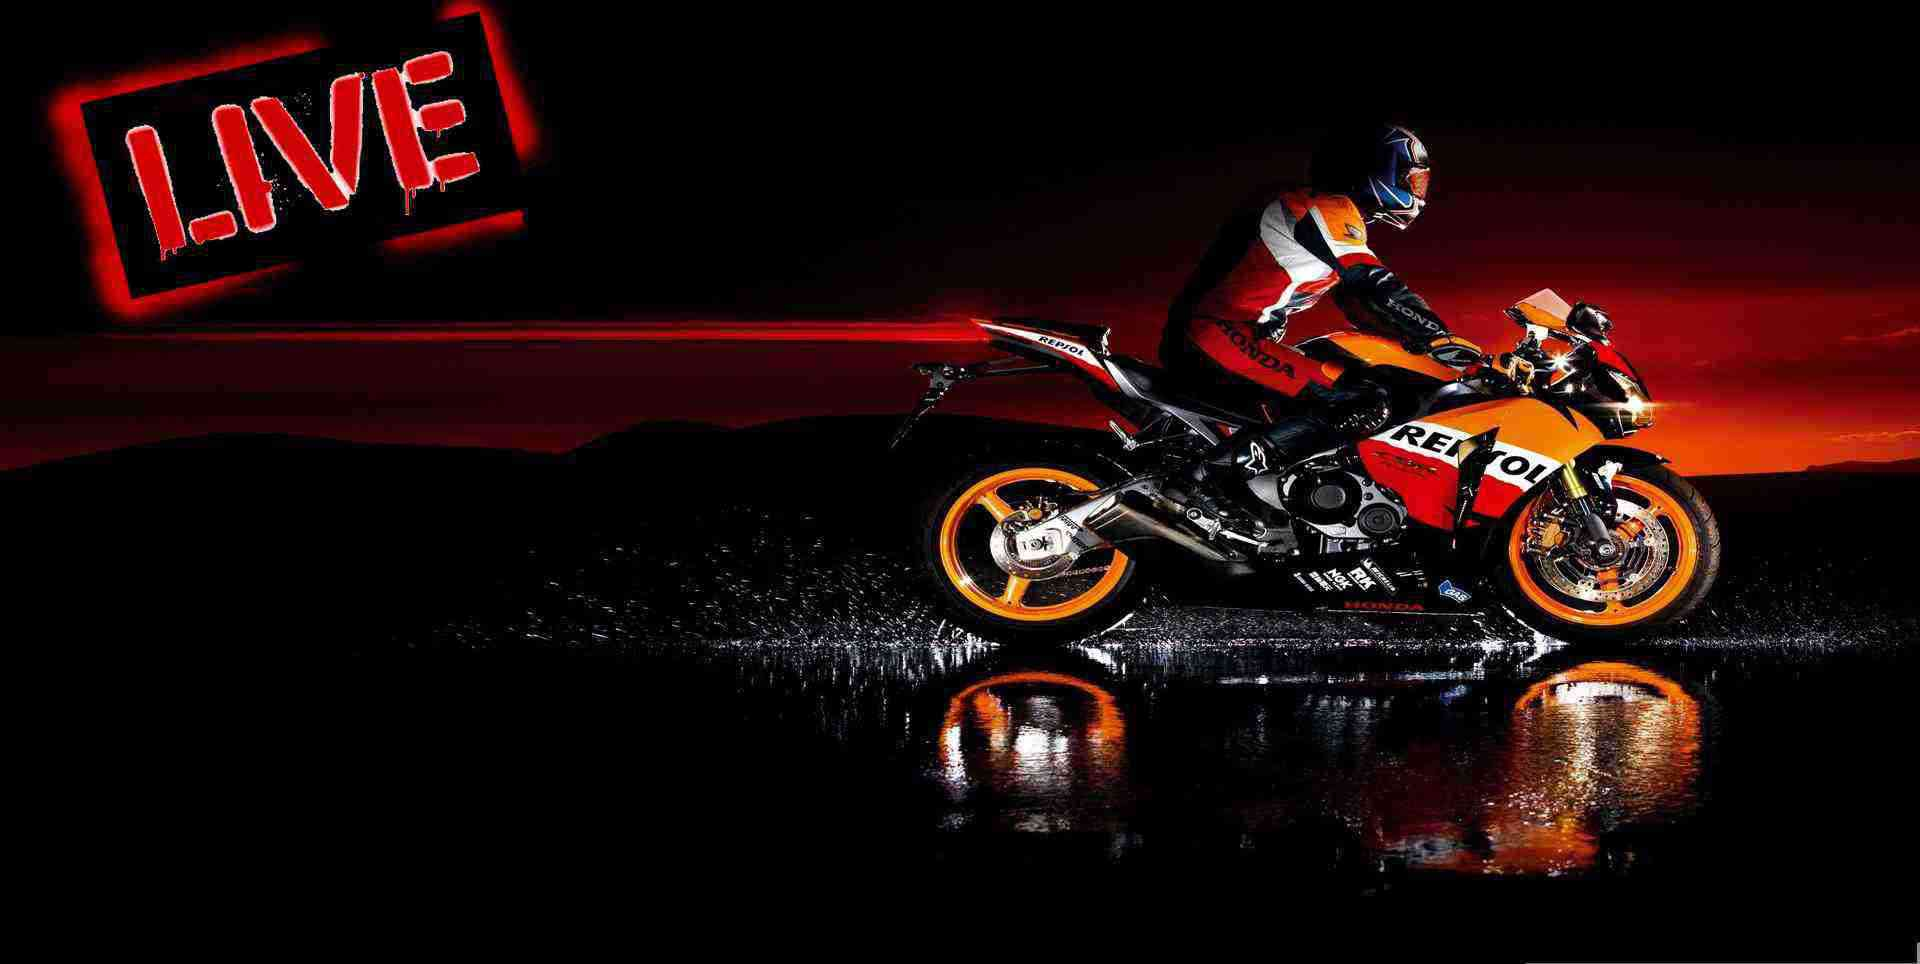 super-bike-pirelli-spanish-round-11-race-2015-live